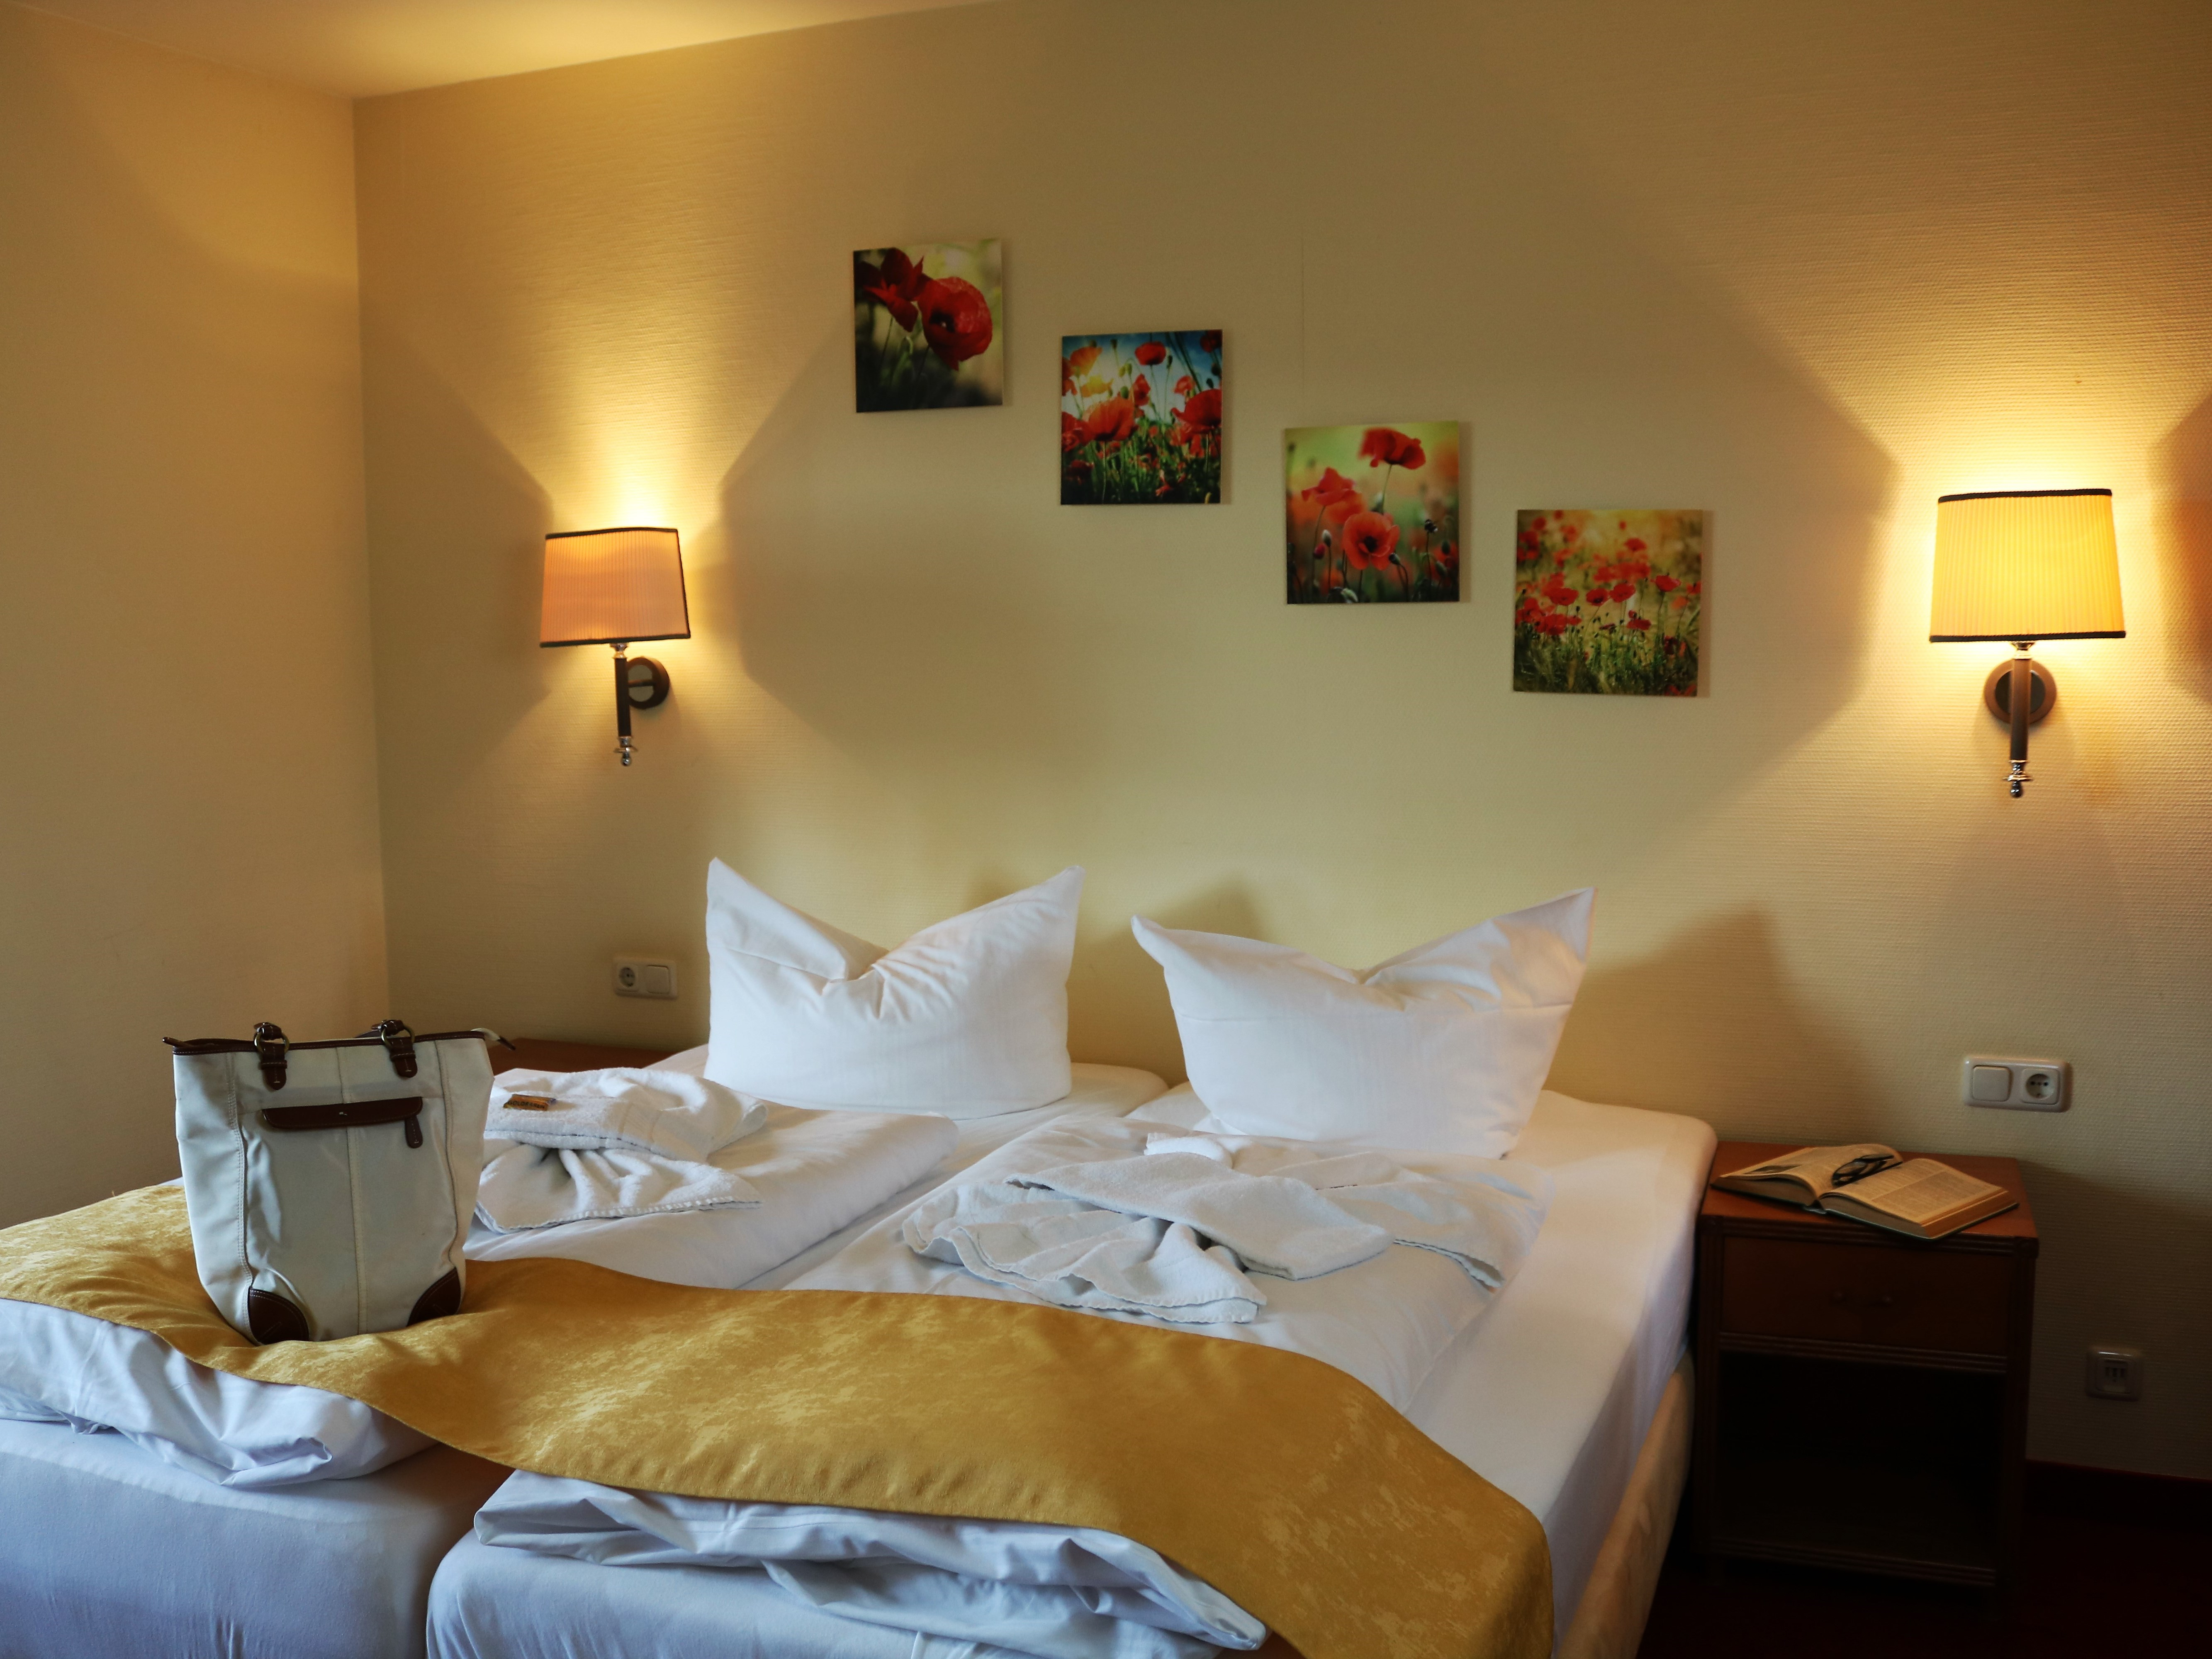 Regiohotel am Brocken in Schierke - Doppelzimmer